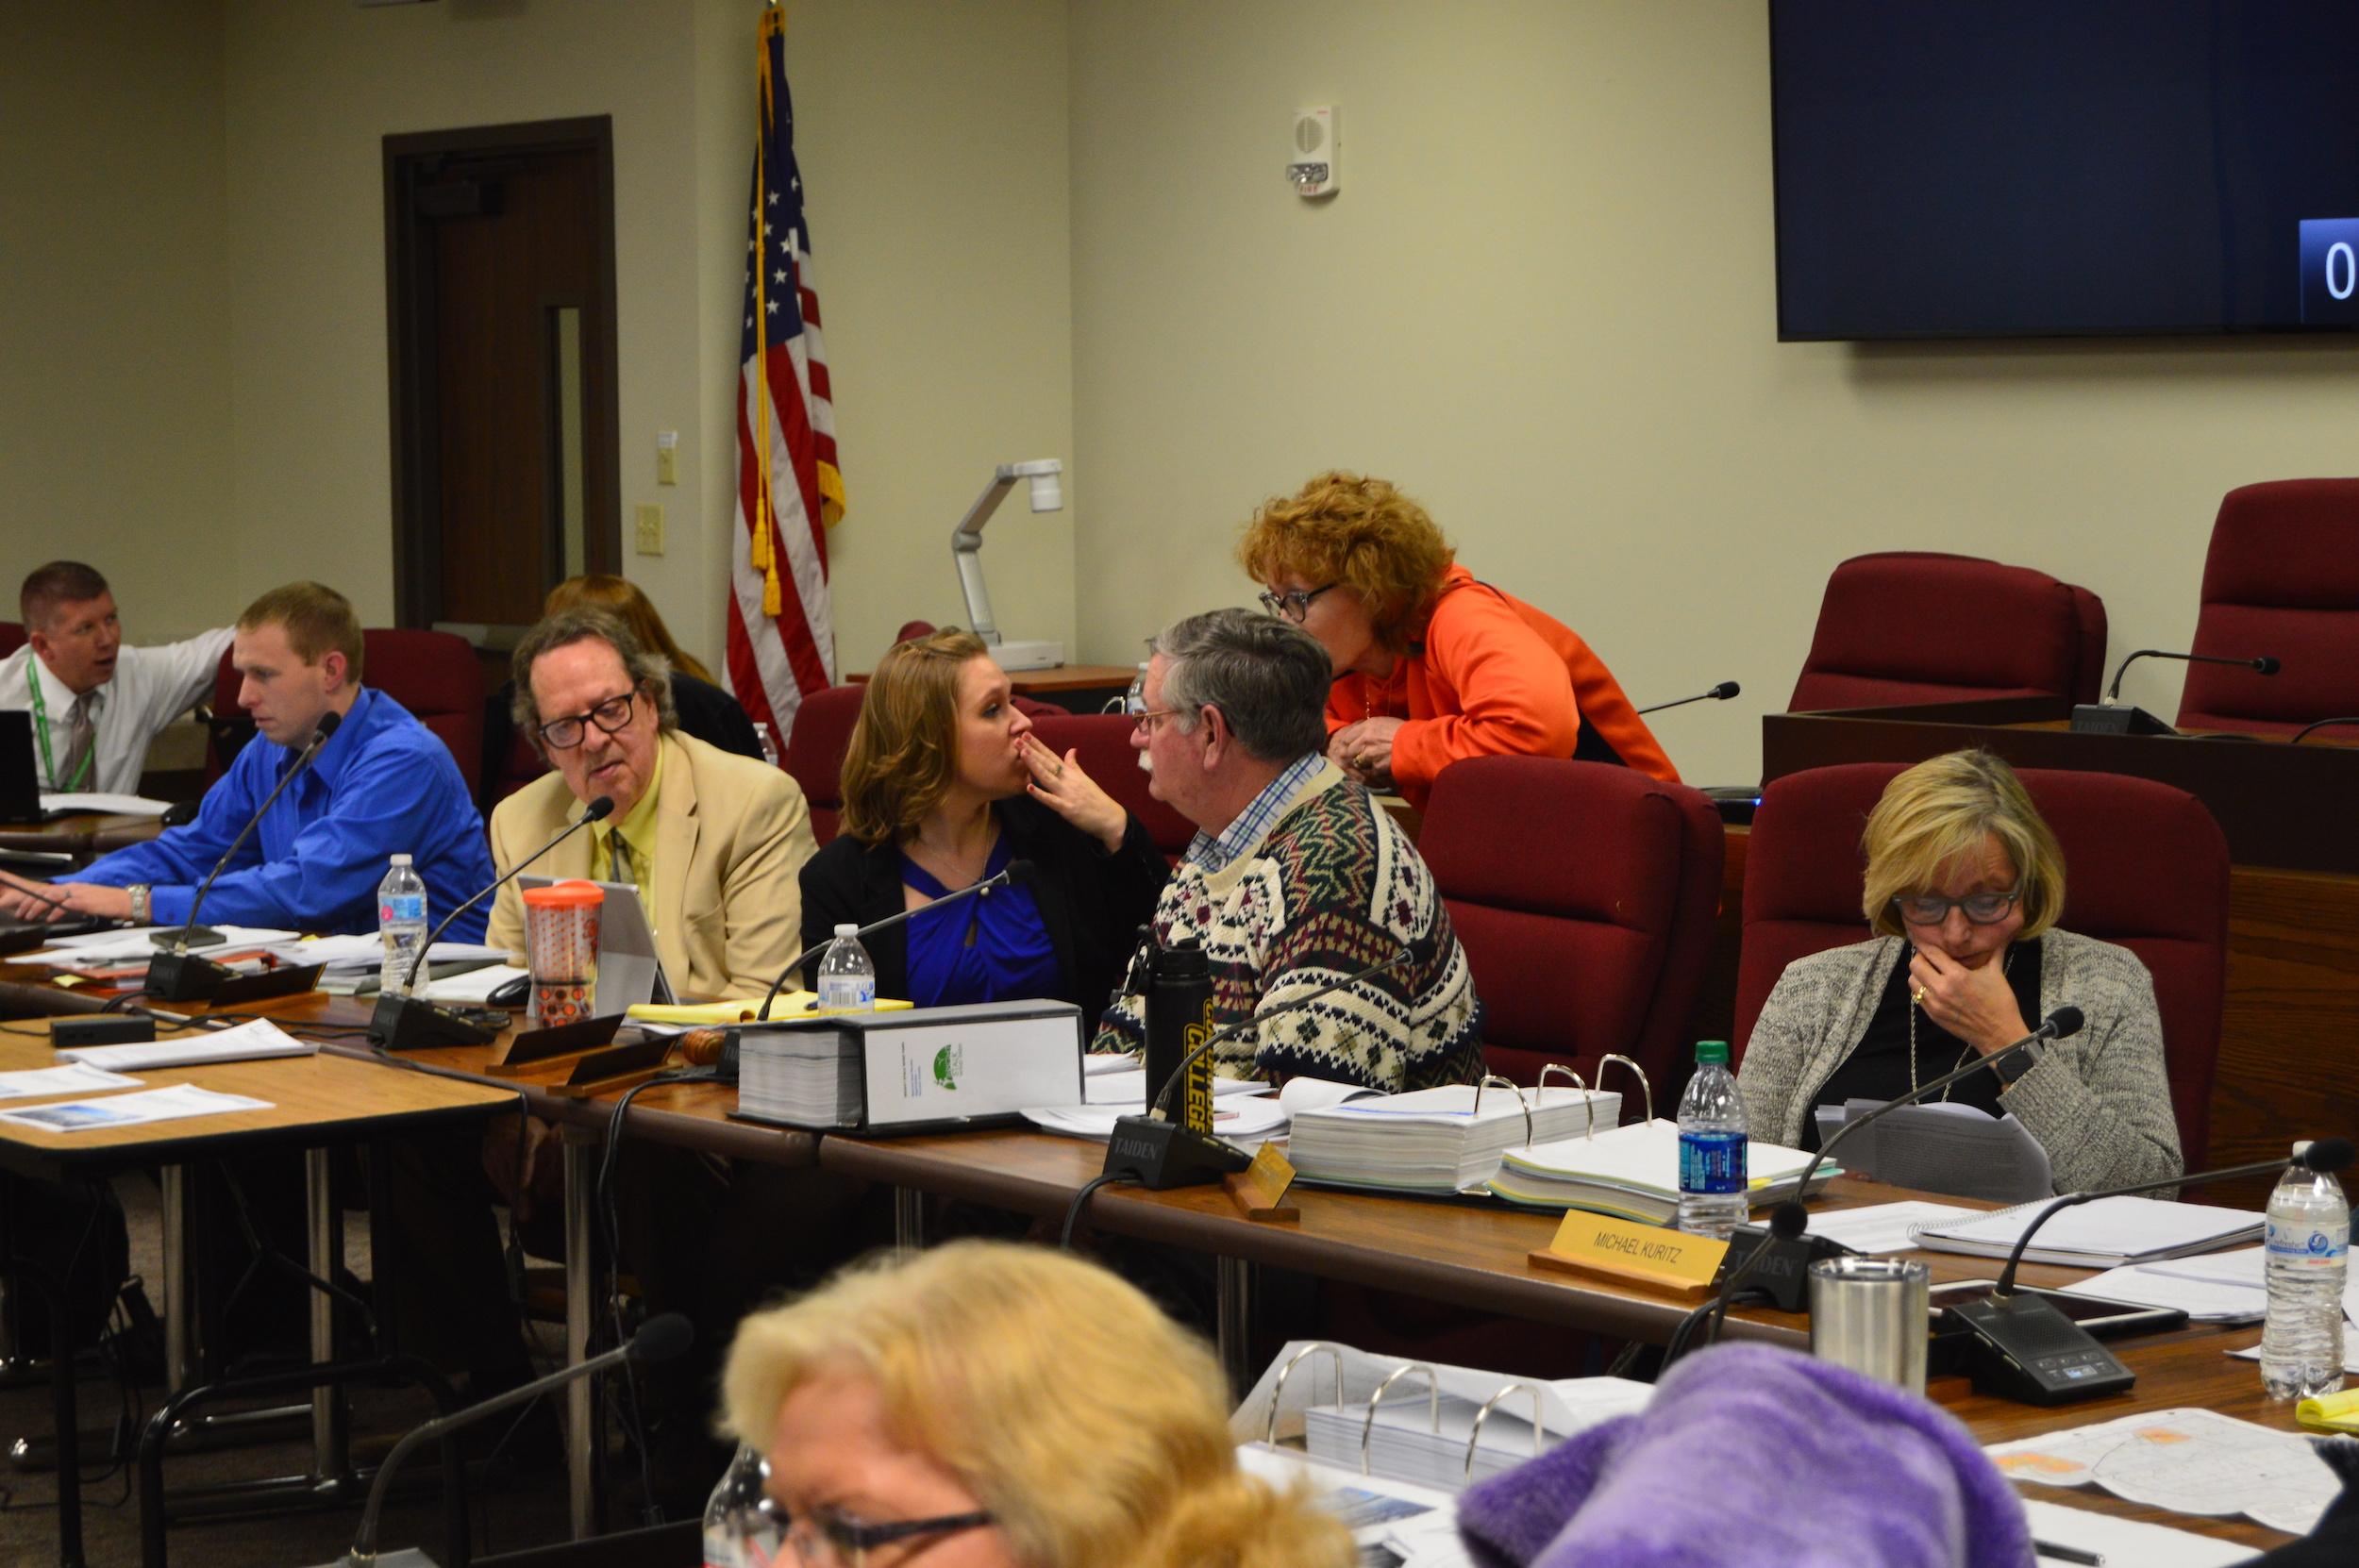 The McLean County Zoning Board of Appeals deliberates on testimony heard Thursday night. (Image credit: Matt Johnson)